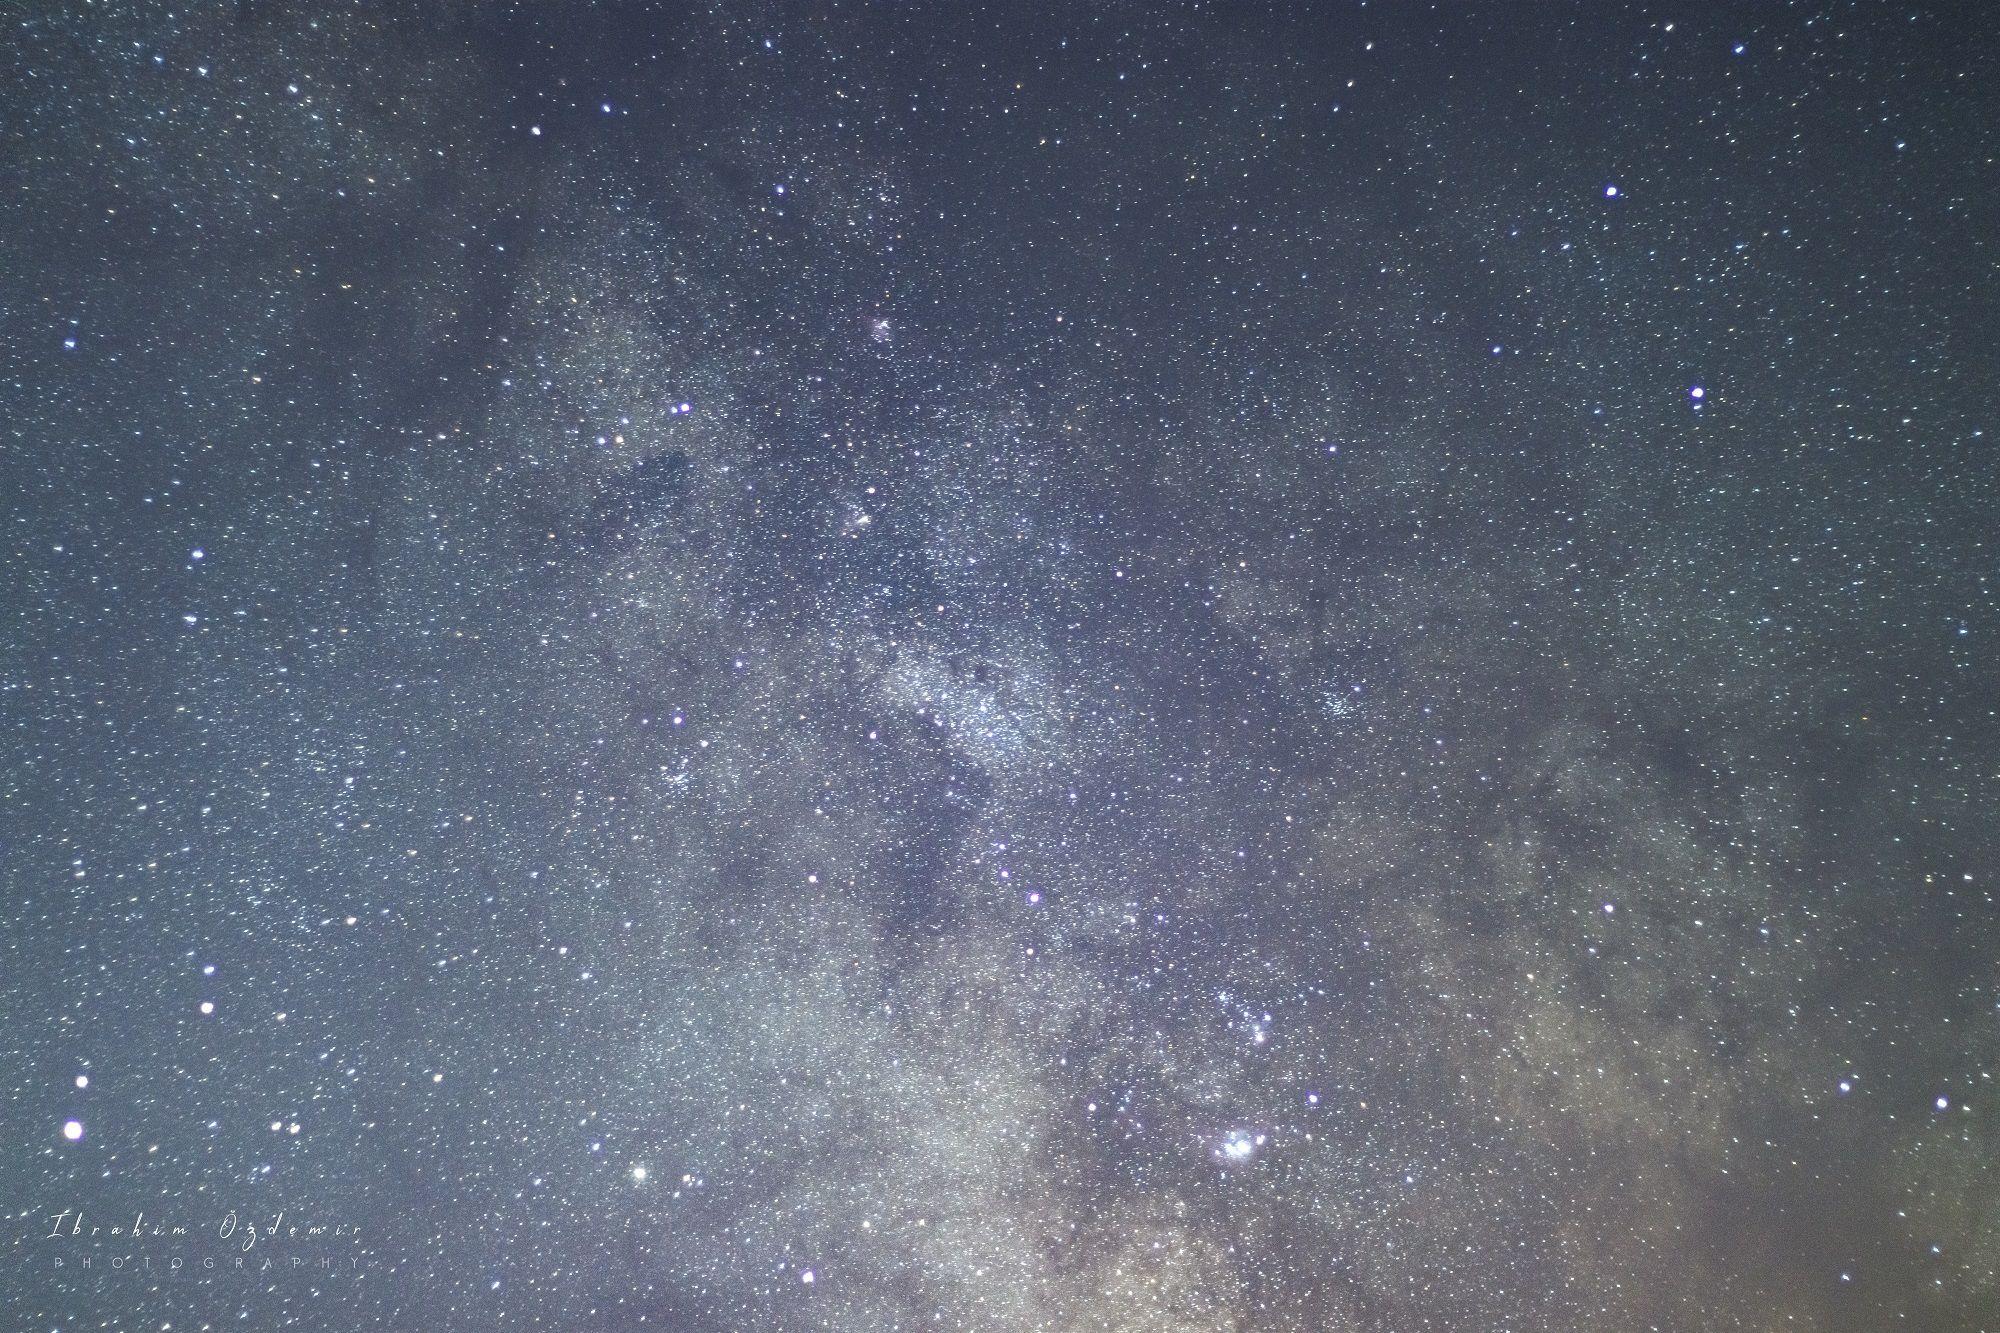 galaxy-stacked-non-merge-jpg.550016